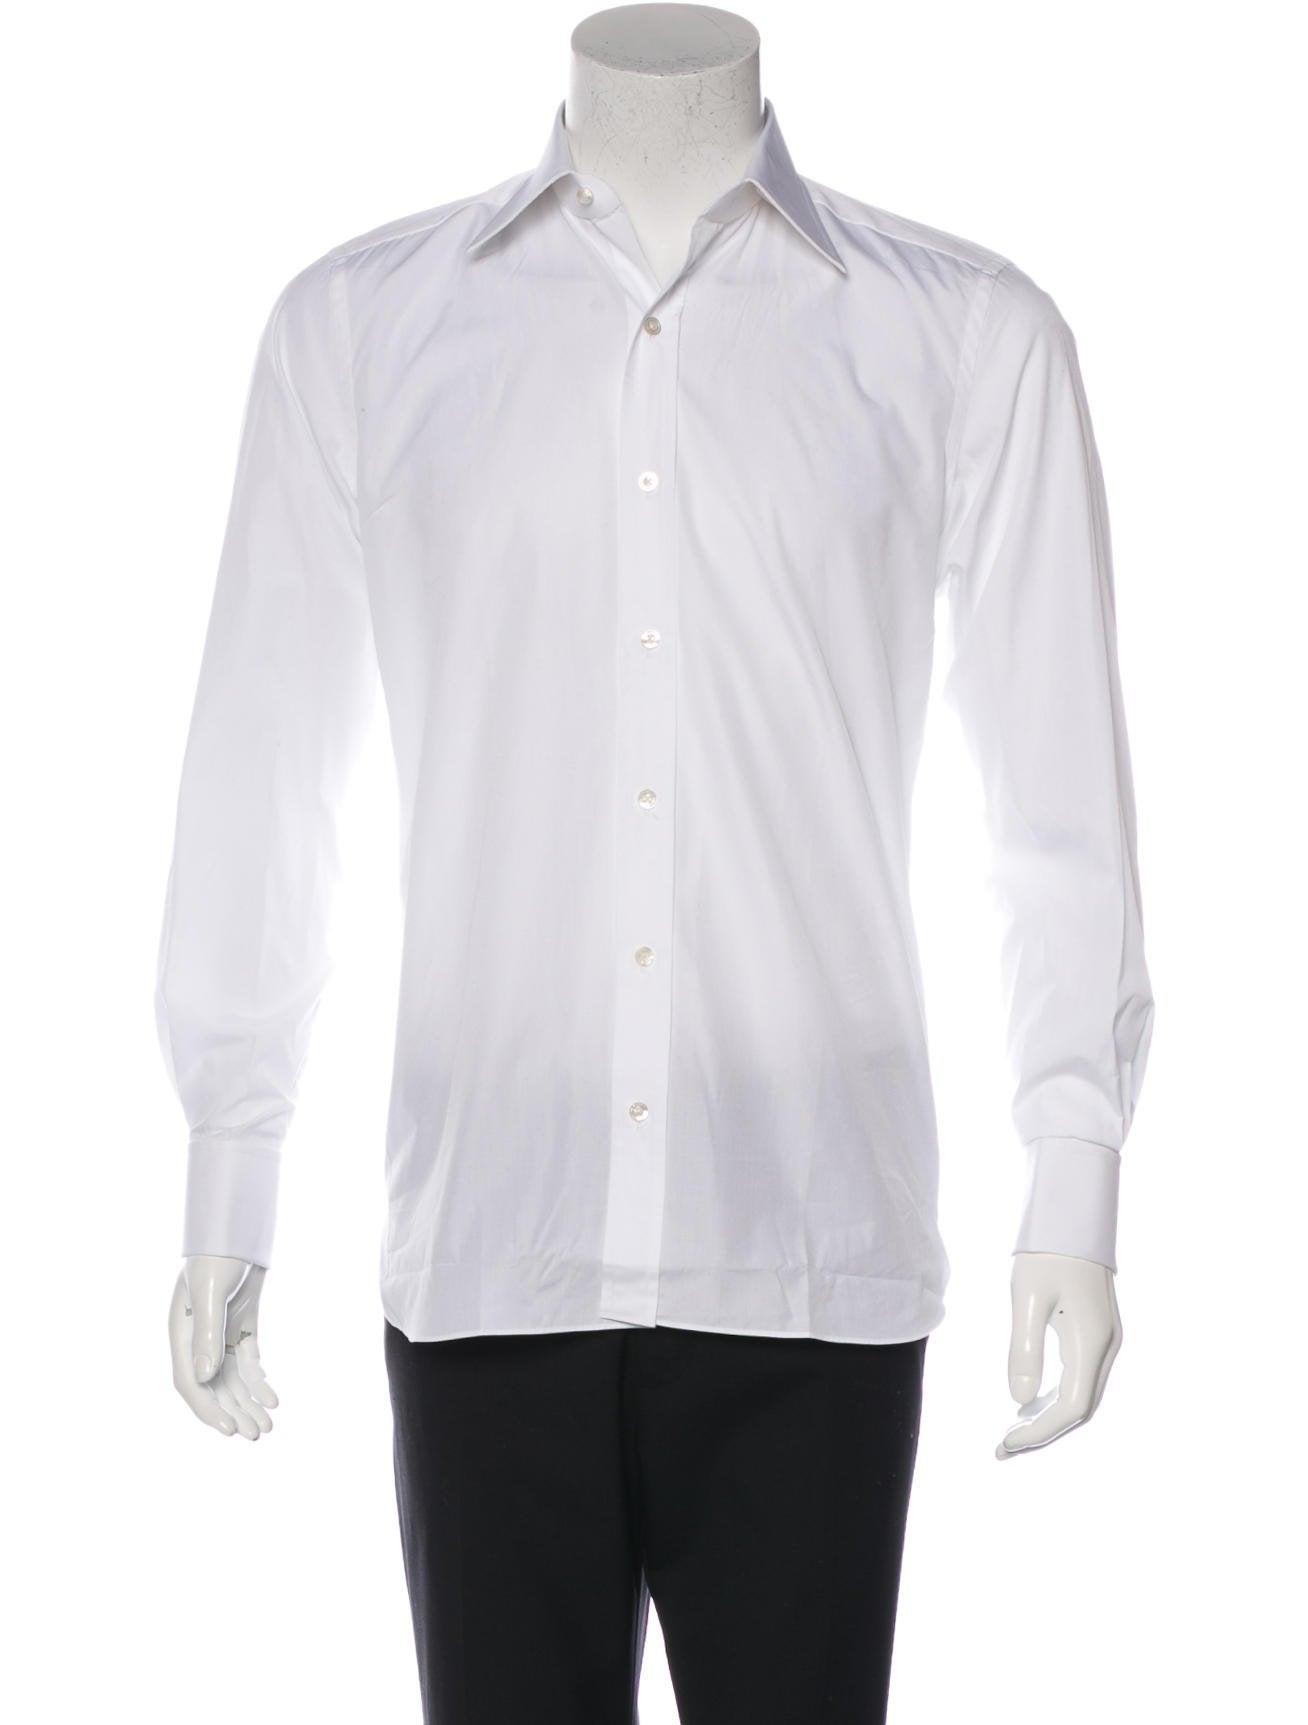 Tom ford french cuff dress shirt clothing tom34541 for Dress shirt french cuffs